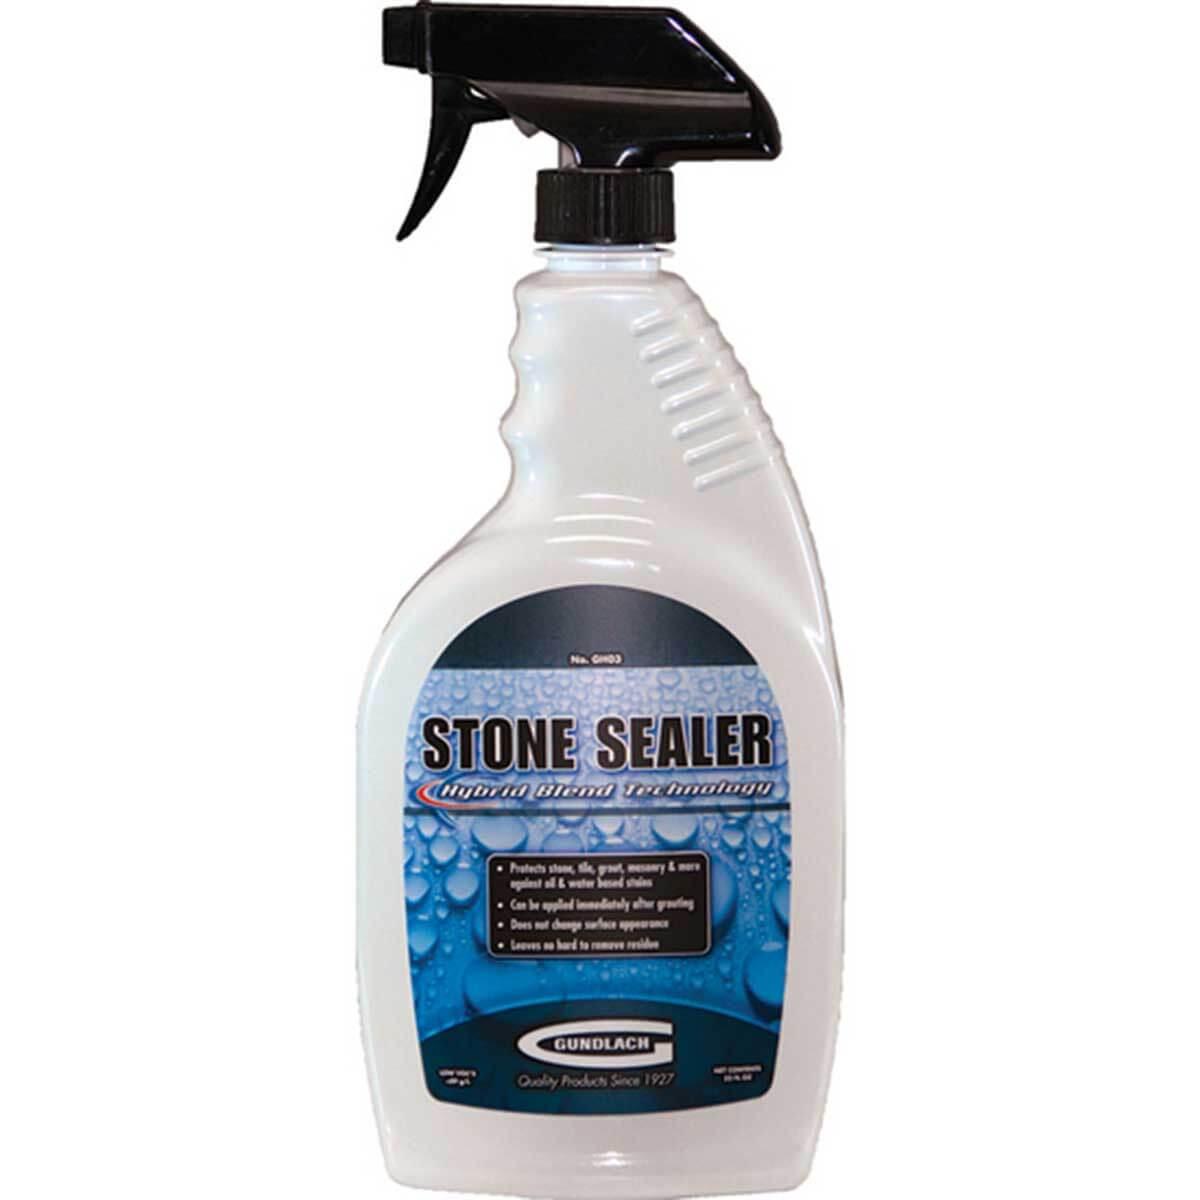 Stone Sealer Quart Sprayer GH03